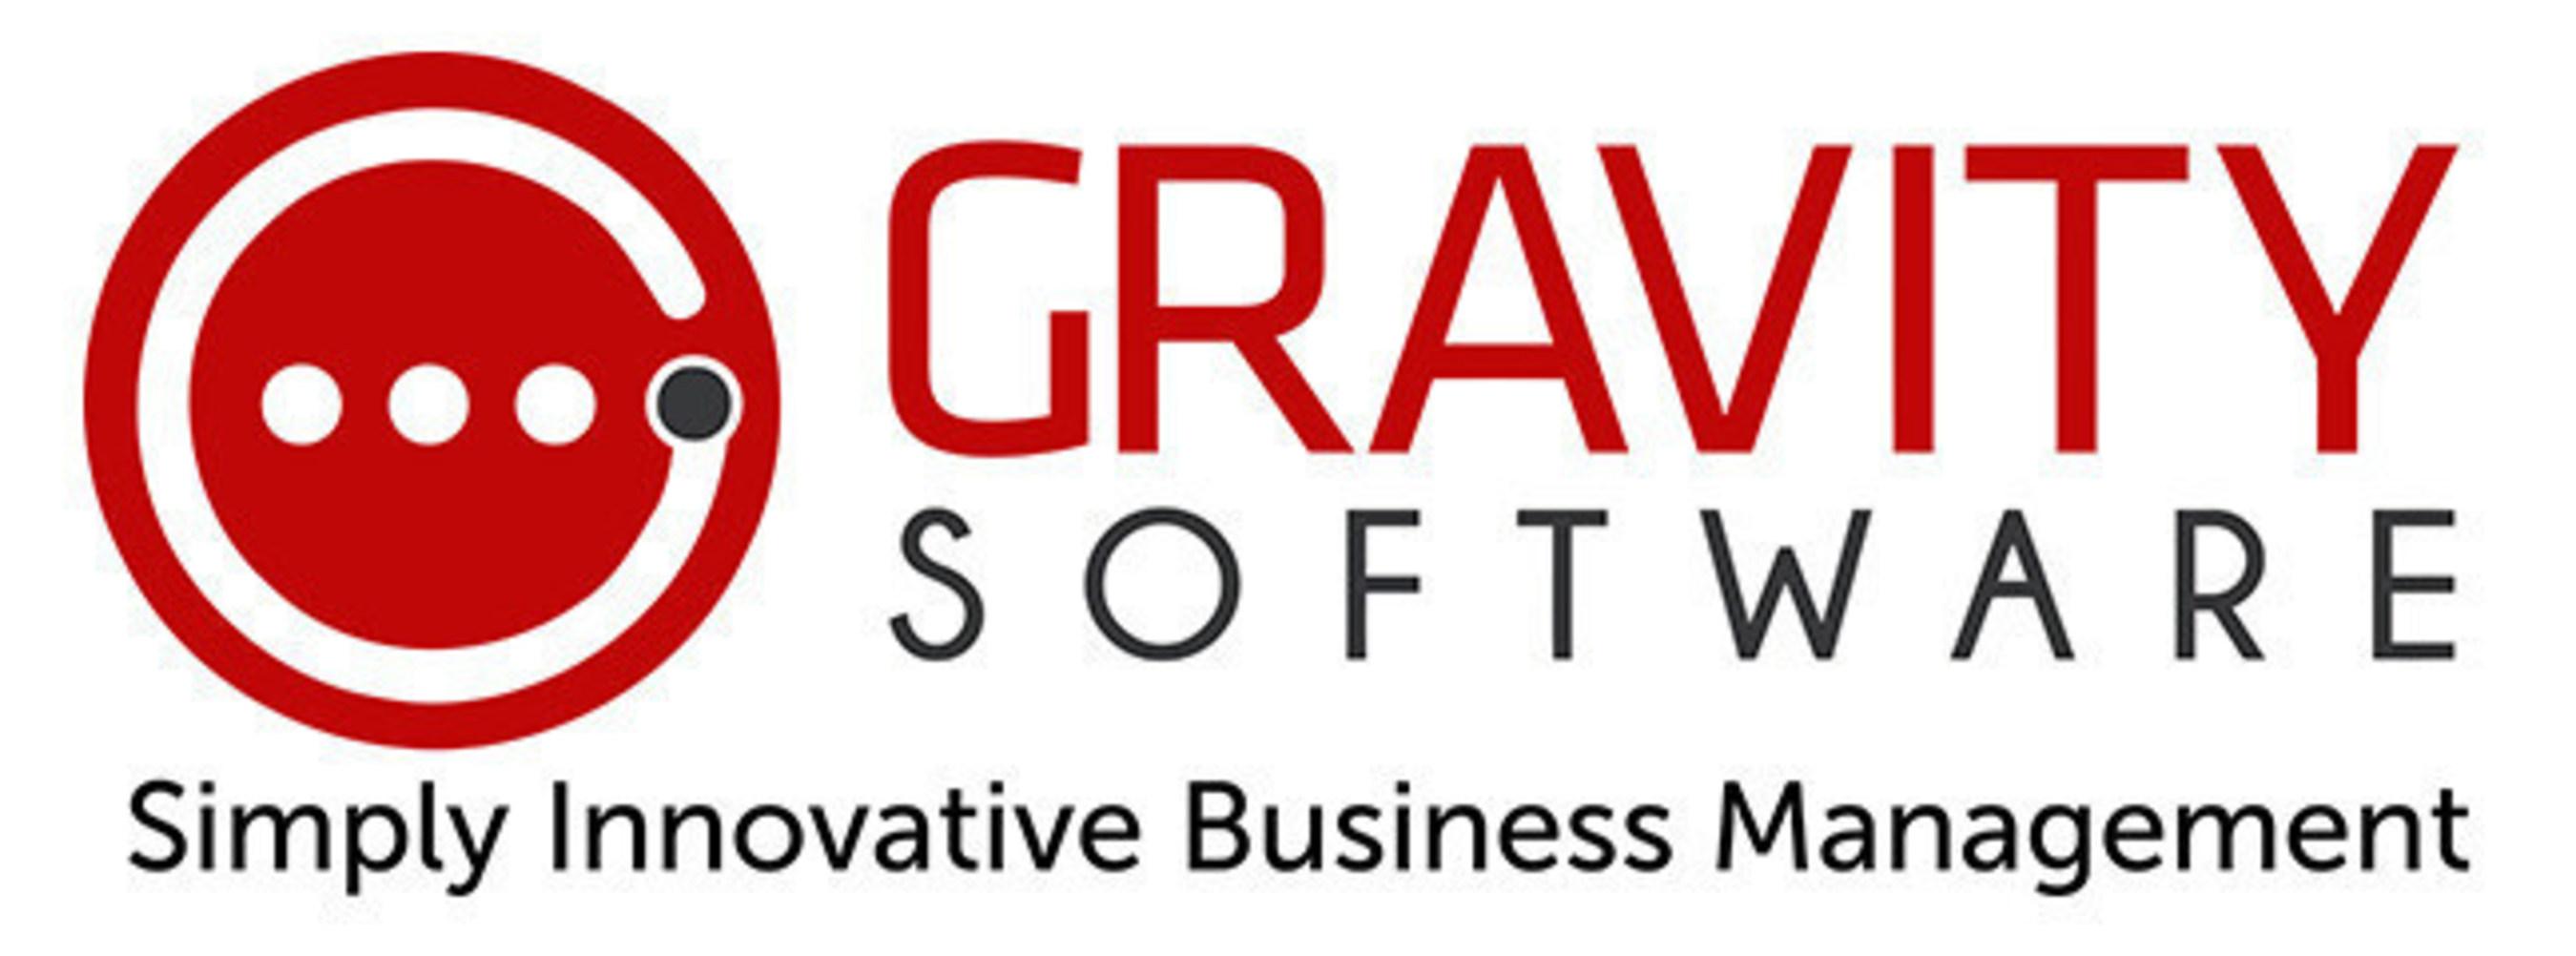 www.go-gravity.com